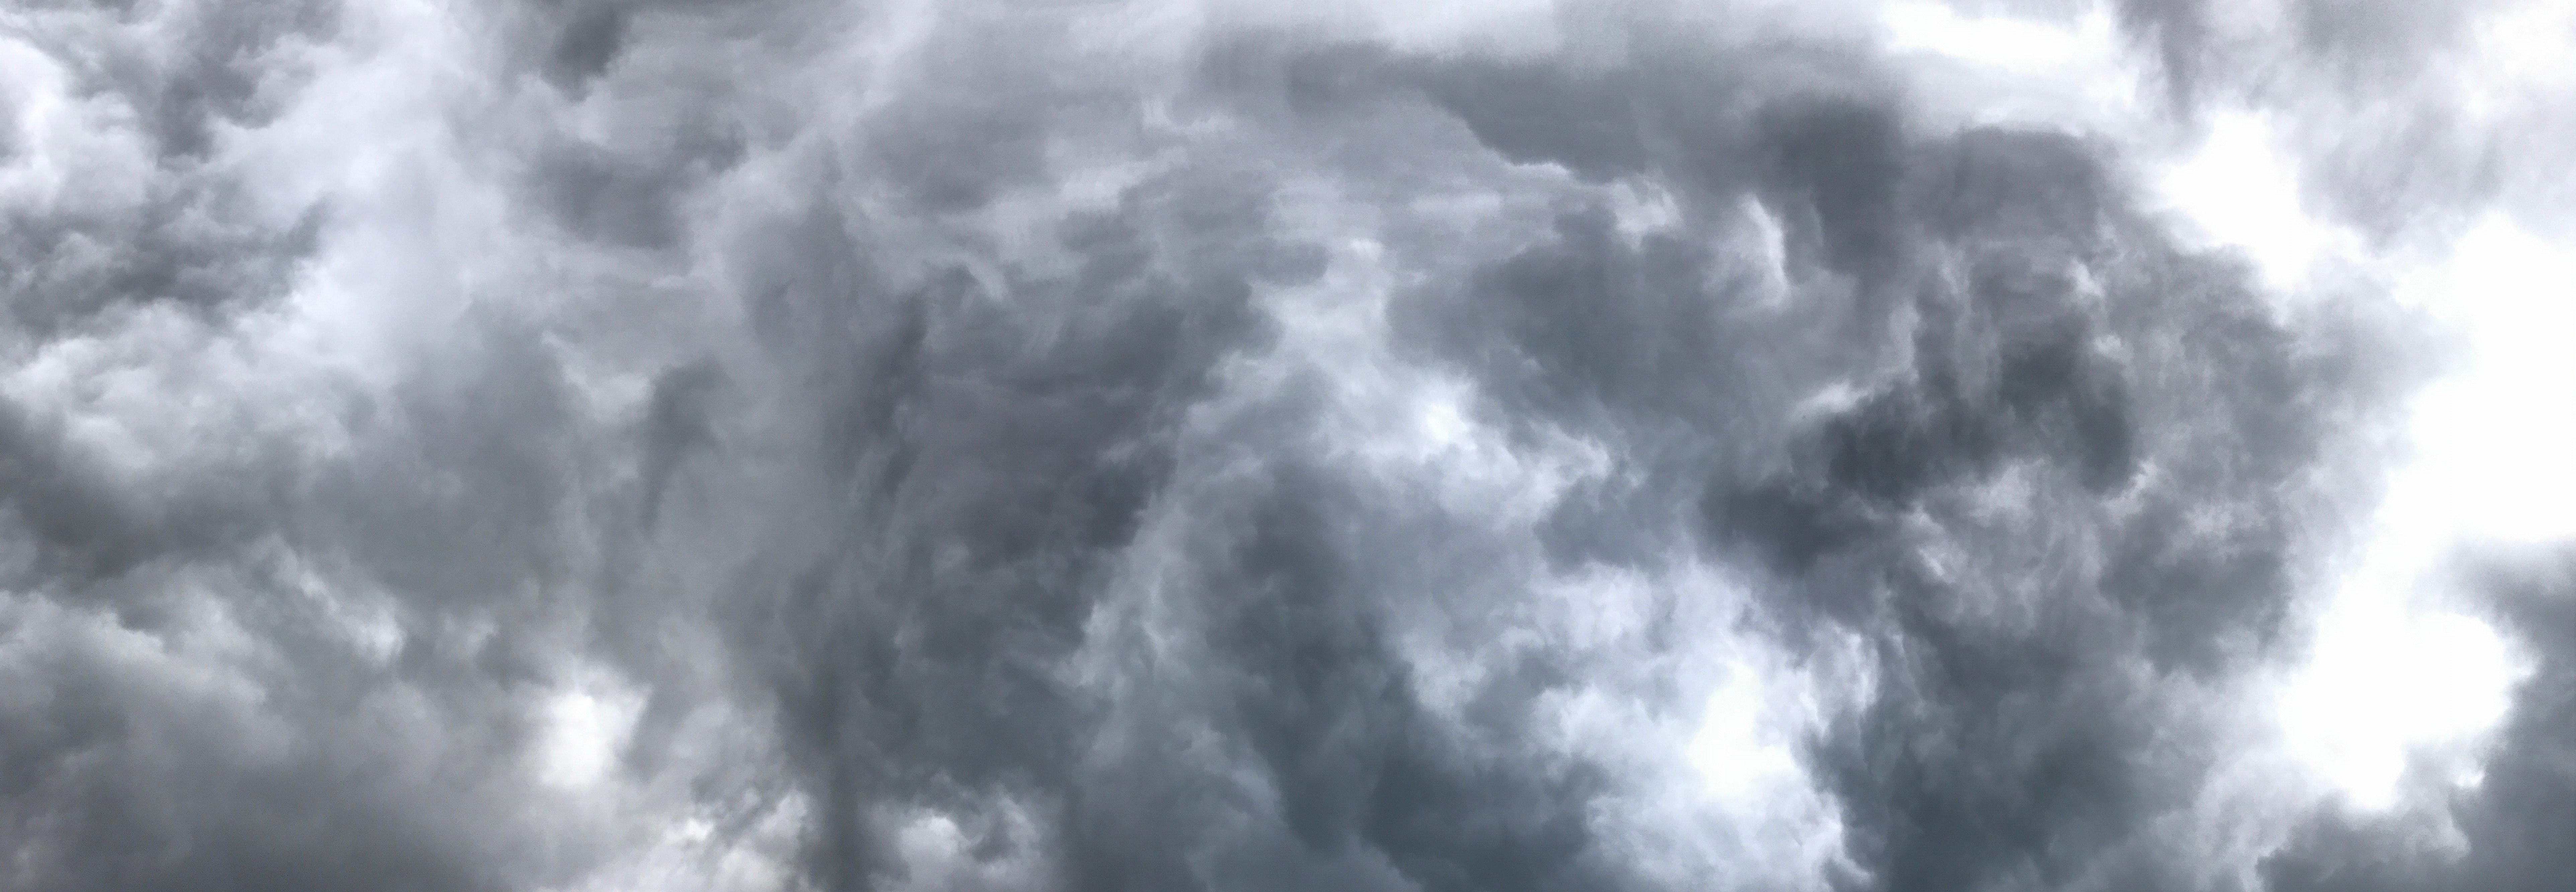 Free stock photo of Dark Sky, dramatic sky